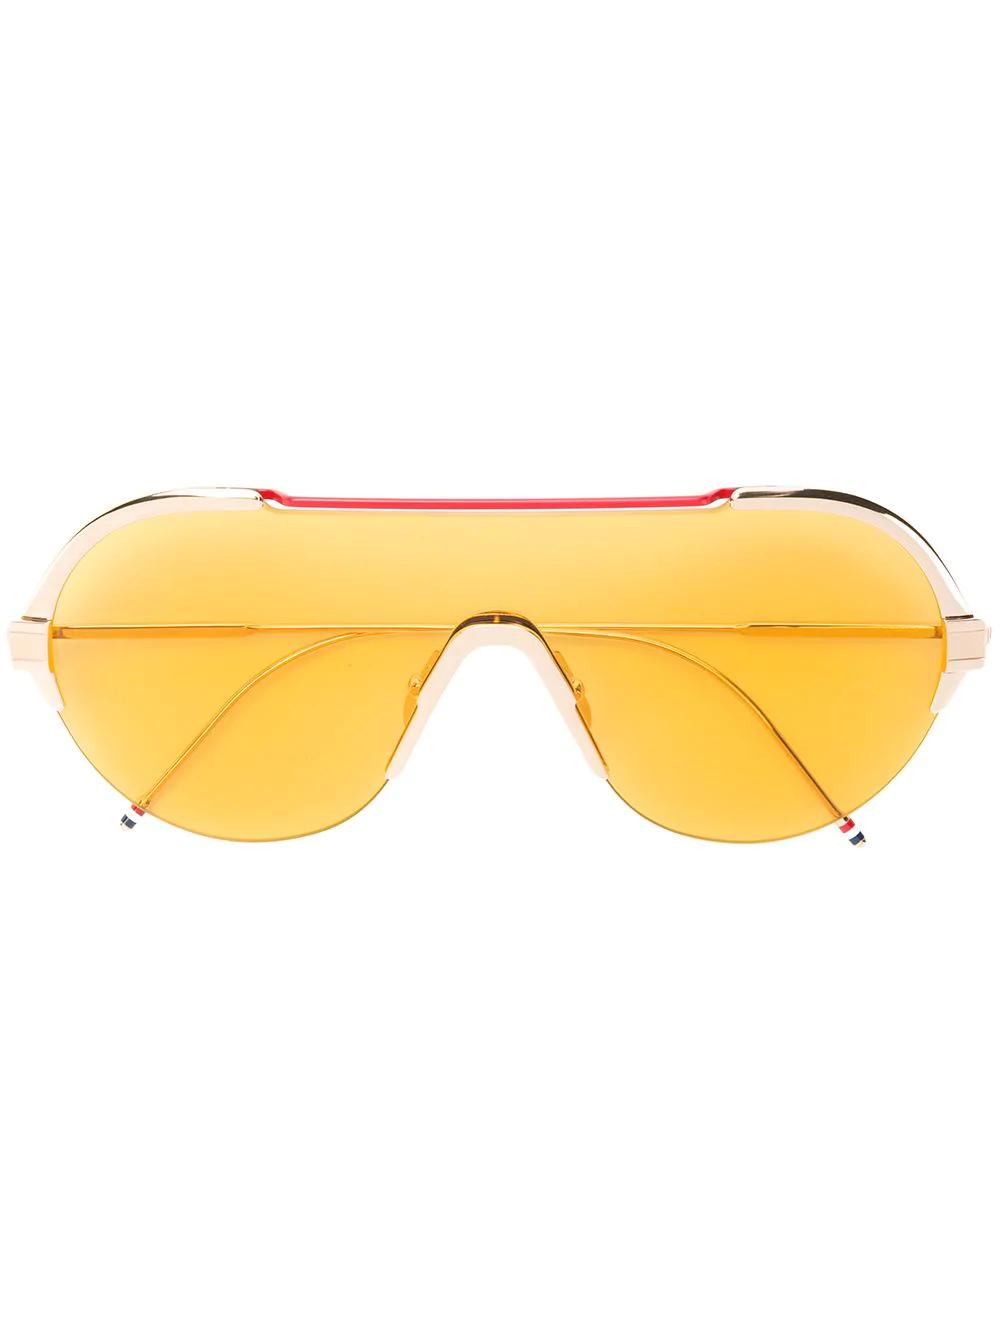 39366f5fe72a Thom Browne Eyewear Aviator Sunglasses - Gold | ModeSens